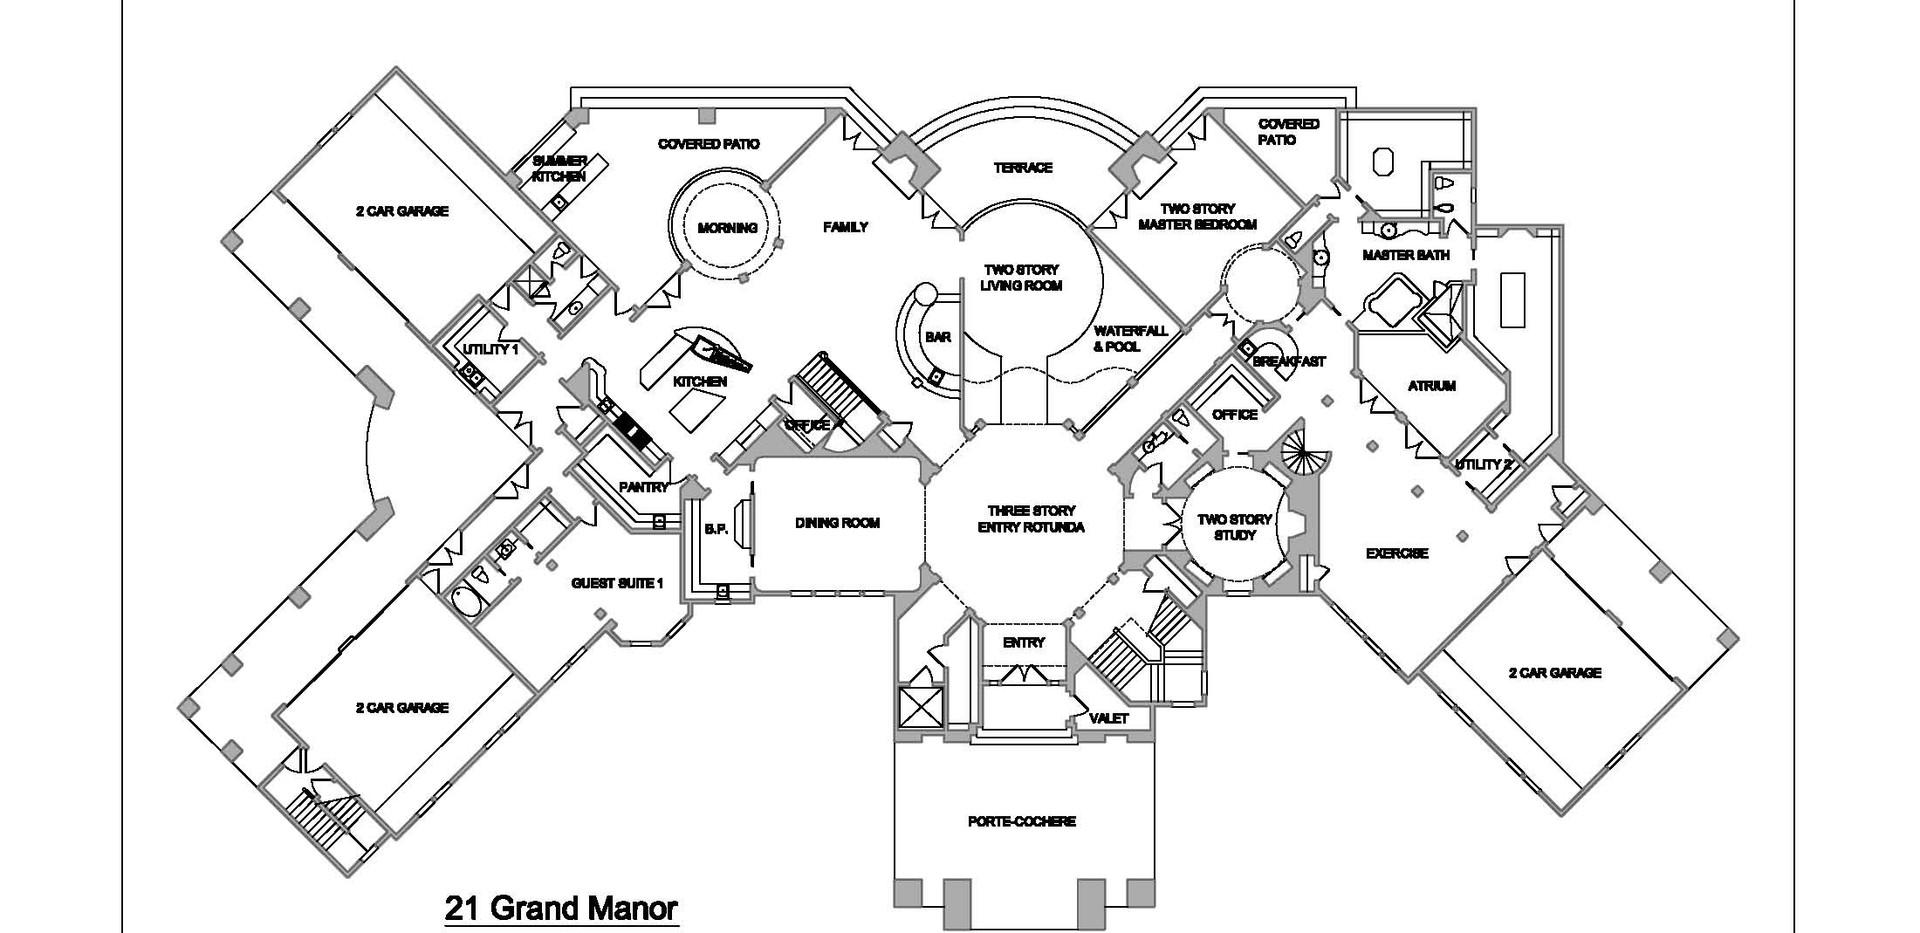 21 Grand Manor First Floor Plan.jpg